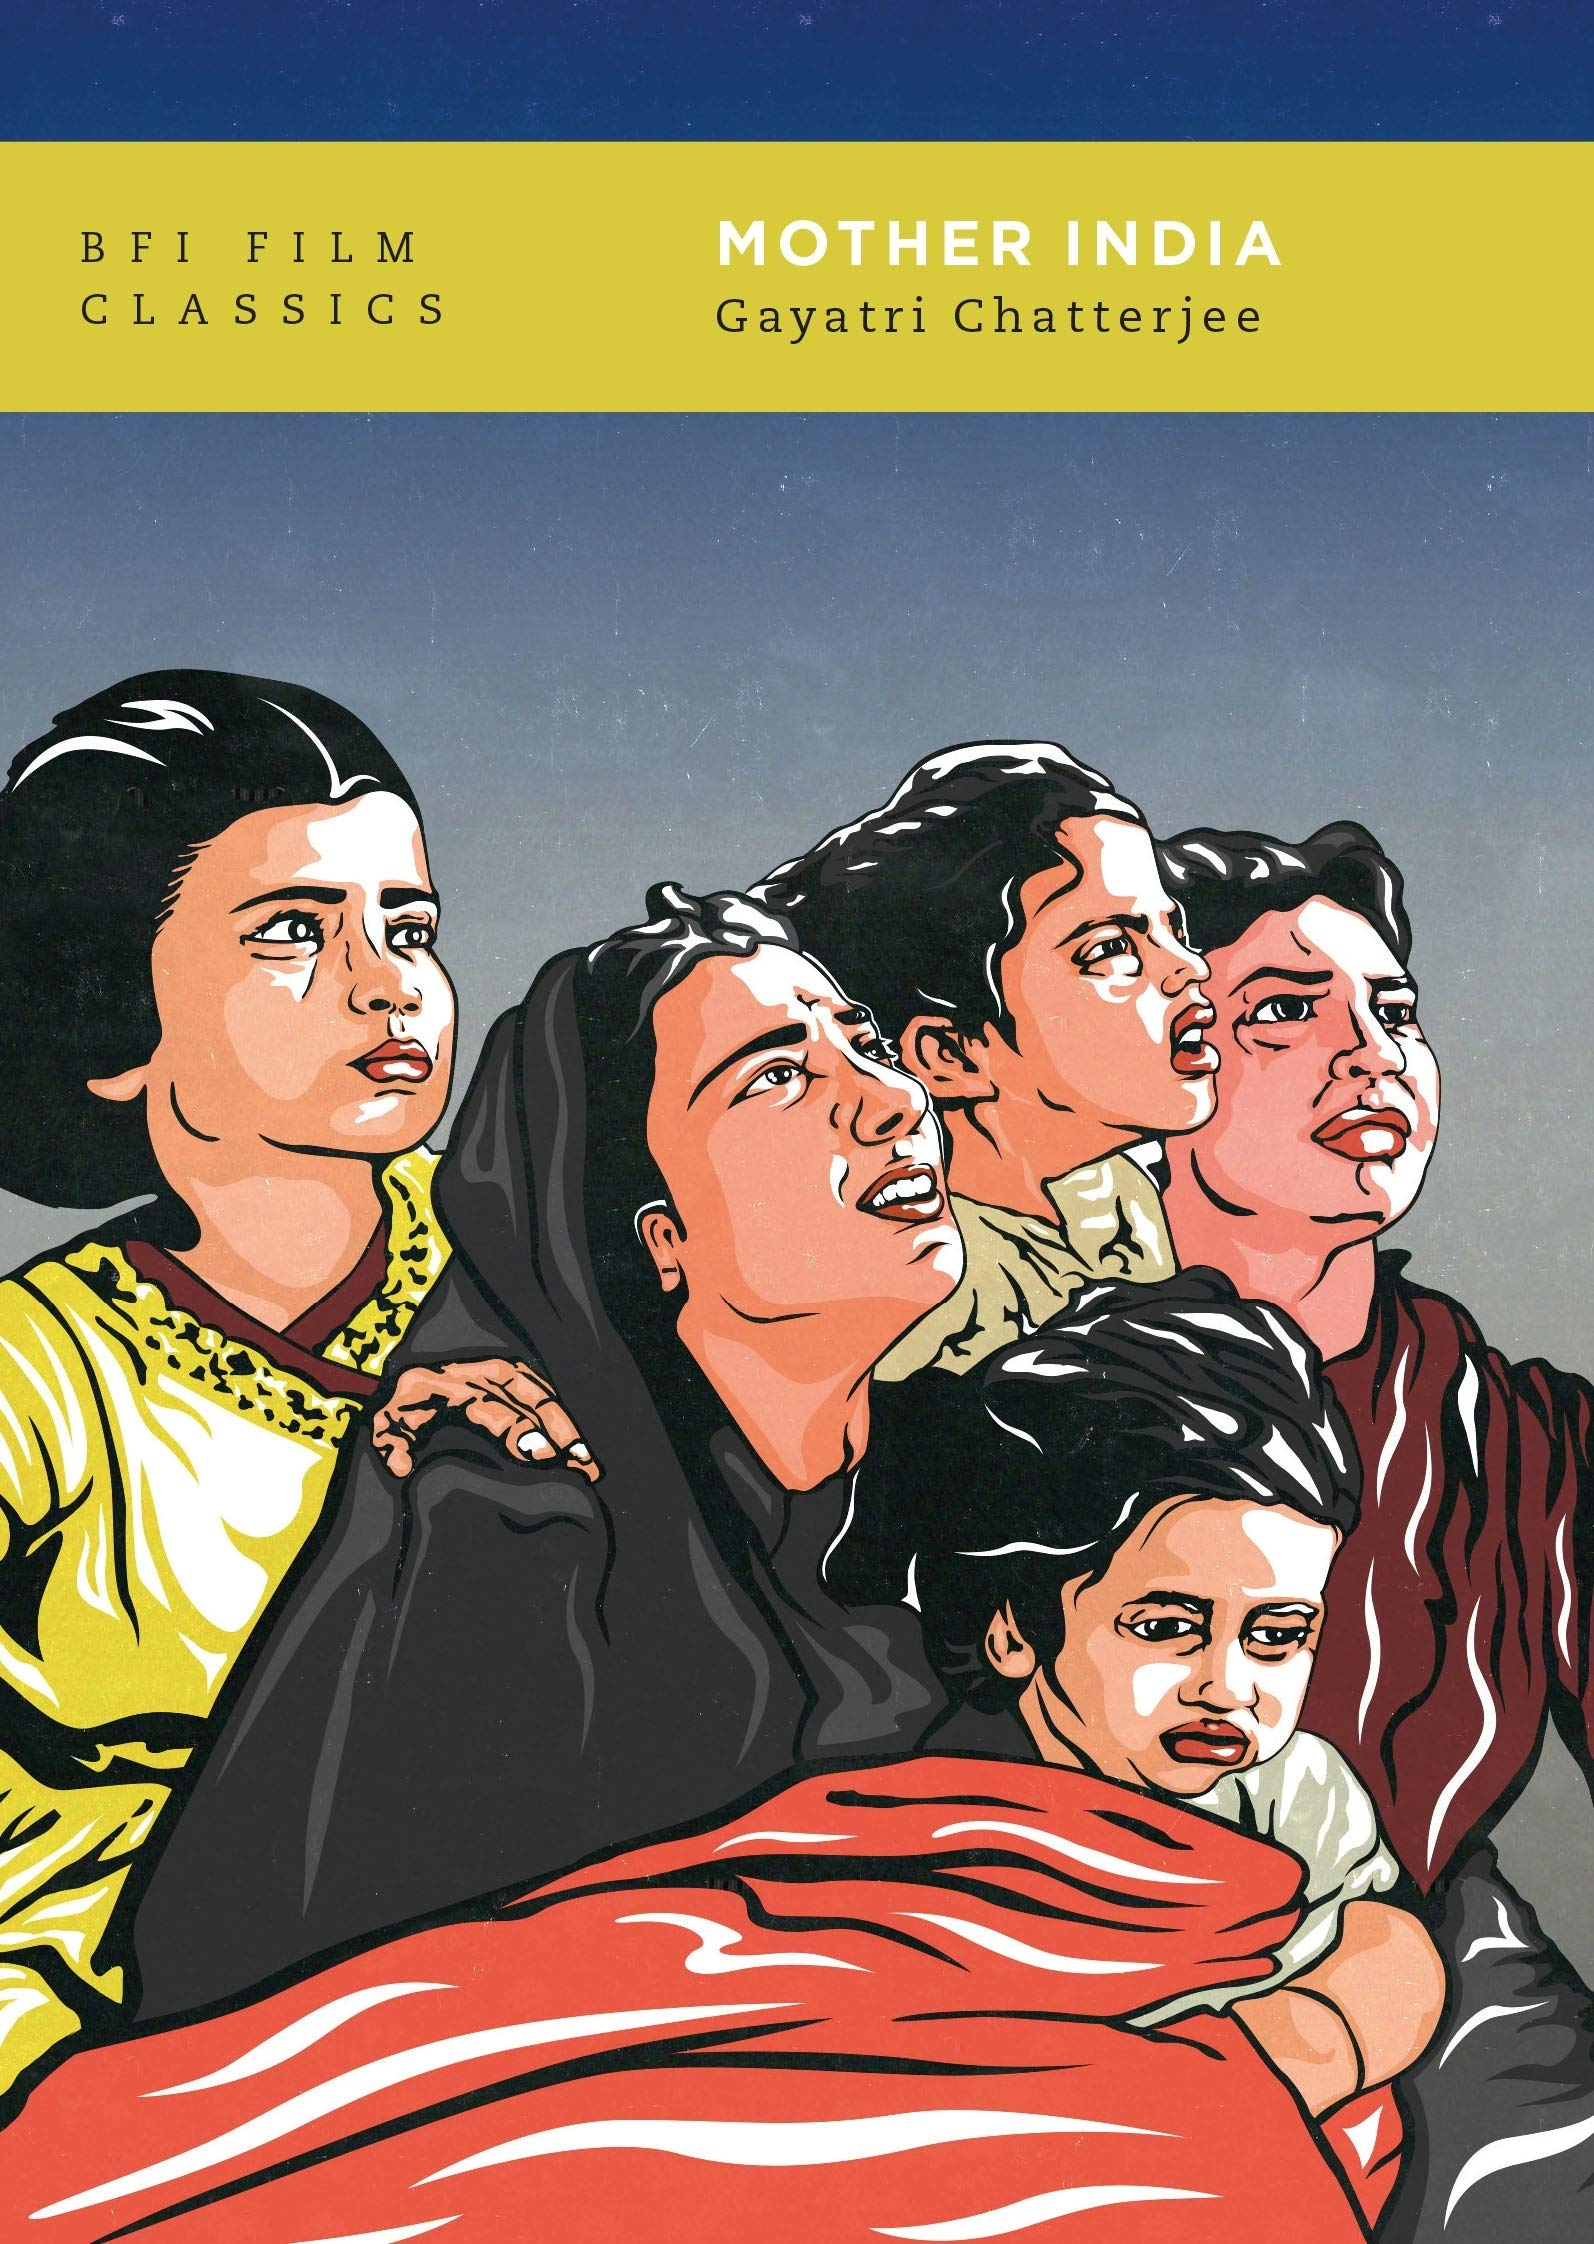 Buy PRE-ORDER Mother India: BFI Film Classics